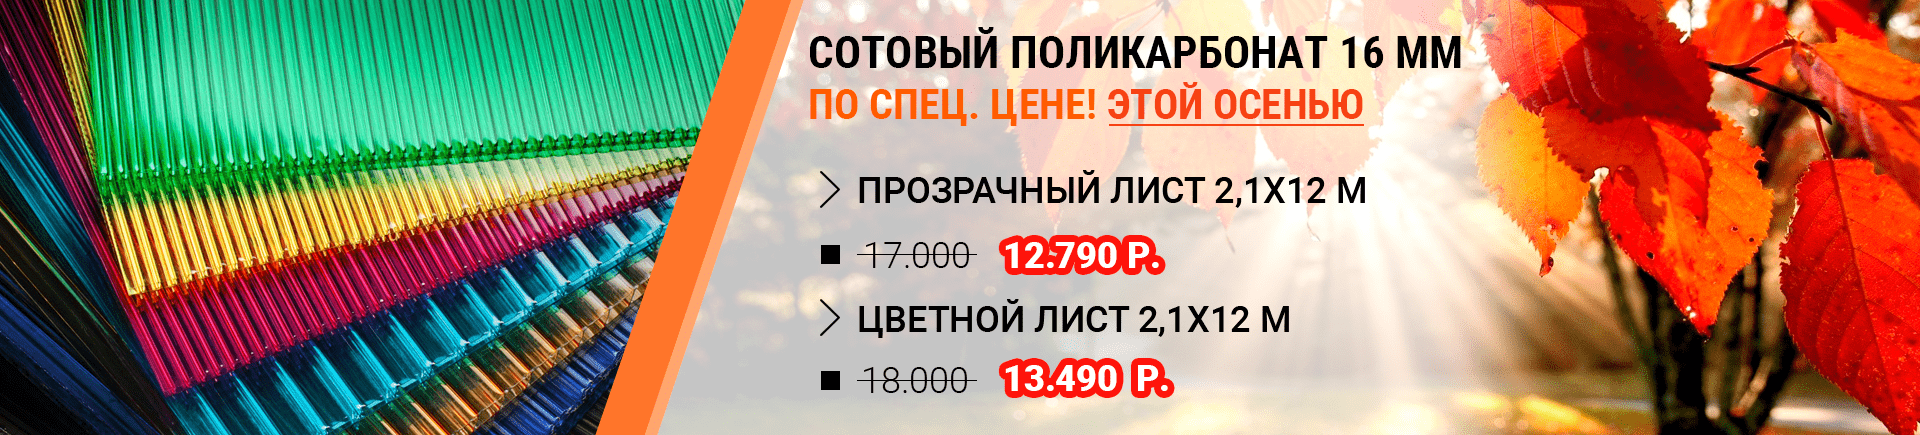 Осенняя акция на сотовый поликабонат 16мм 2020